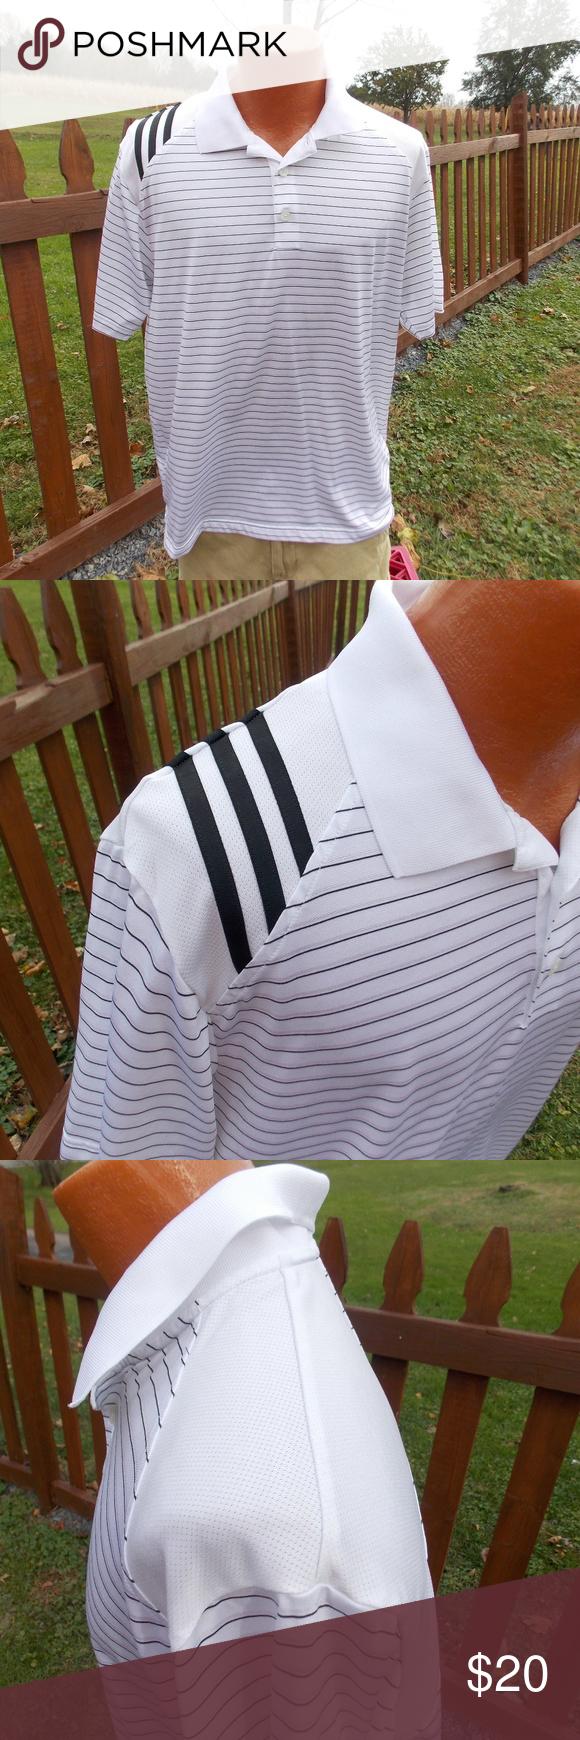 Adidas Clima Cool Mens Golf Polo Shirt Size Large Golf